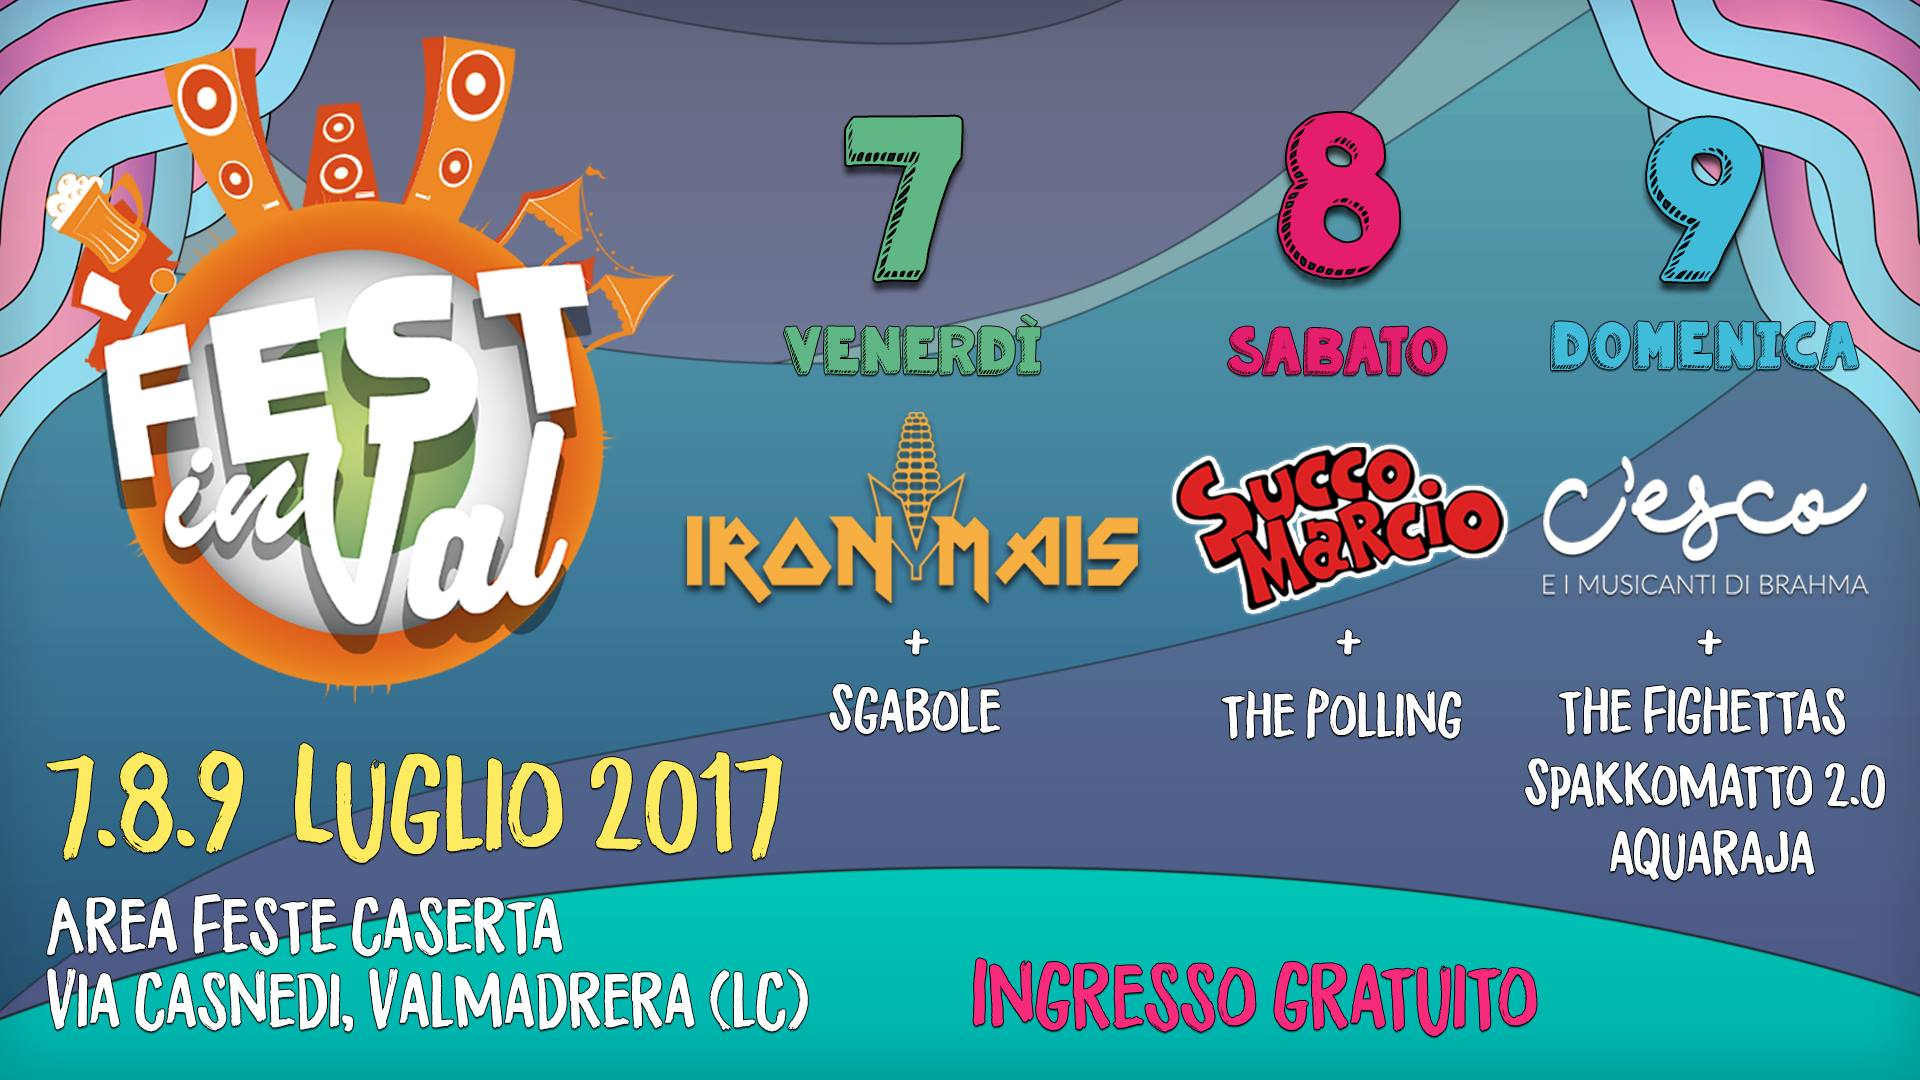 C'esco e i musicanti di Brahma - Fest in Val 2017